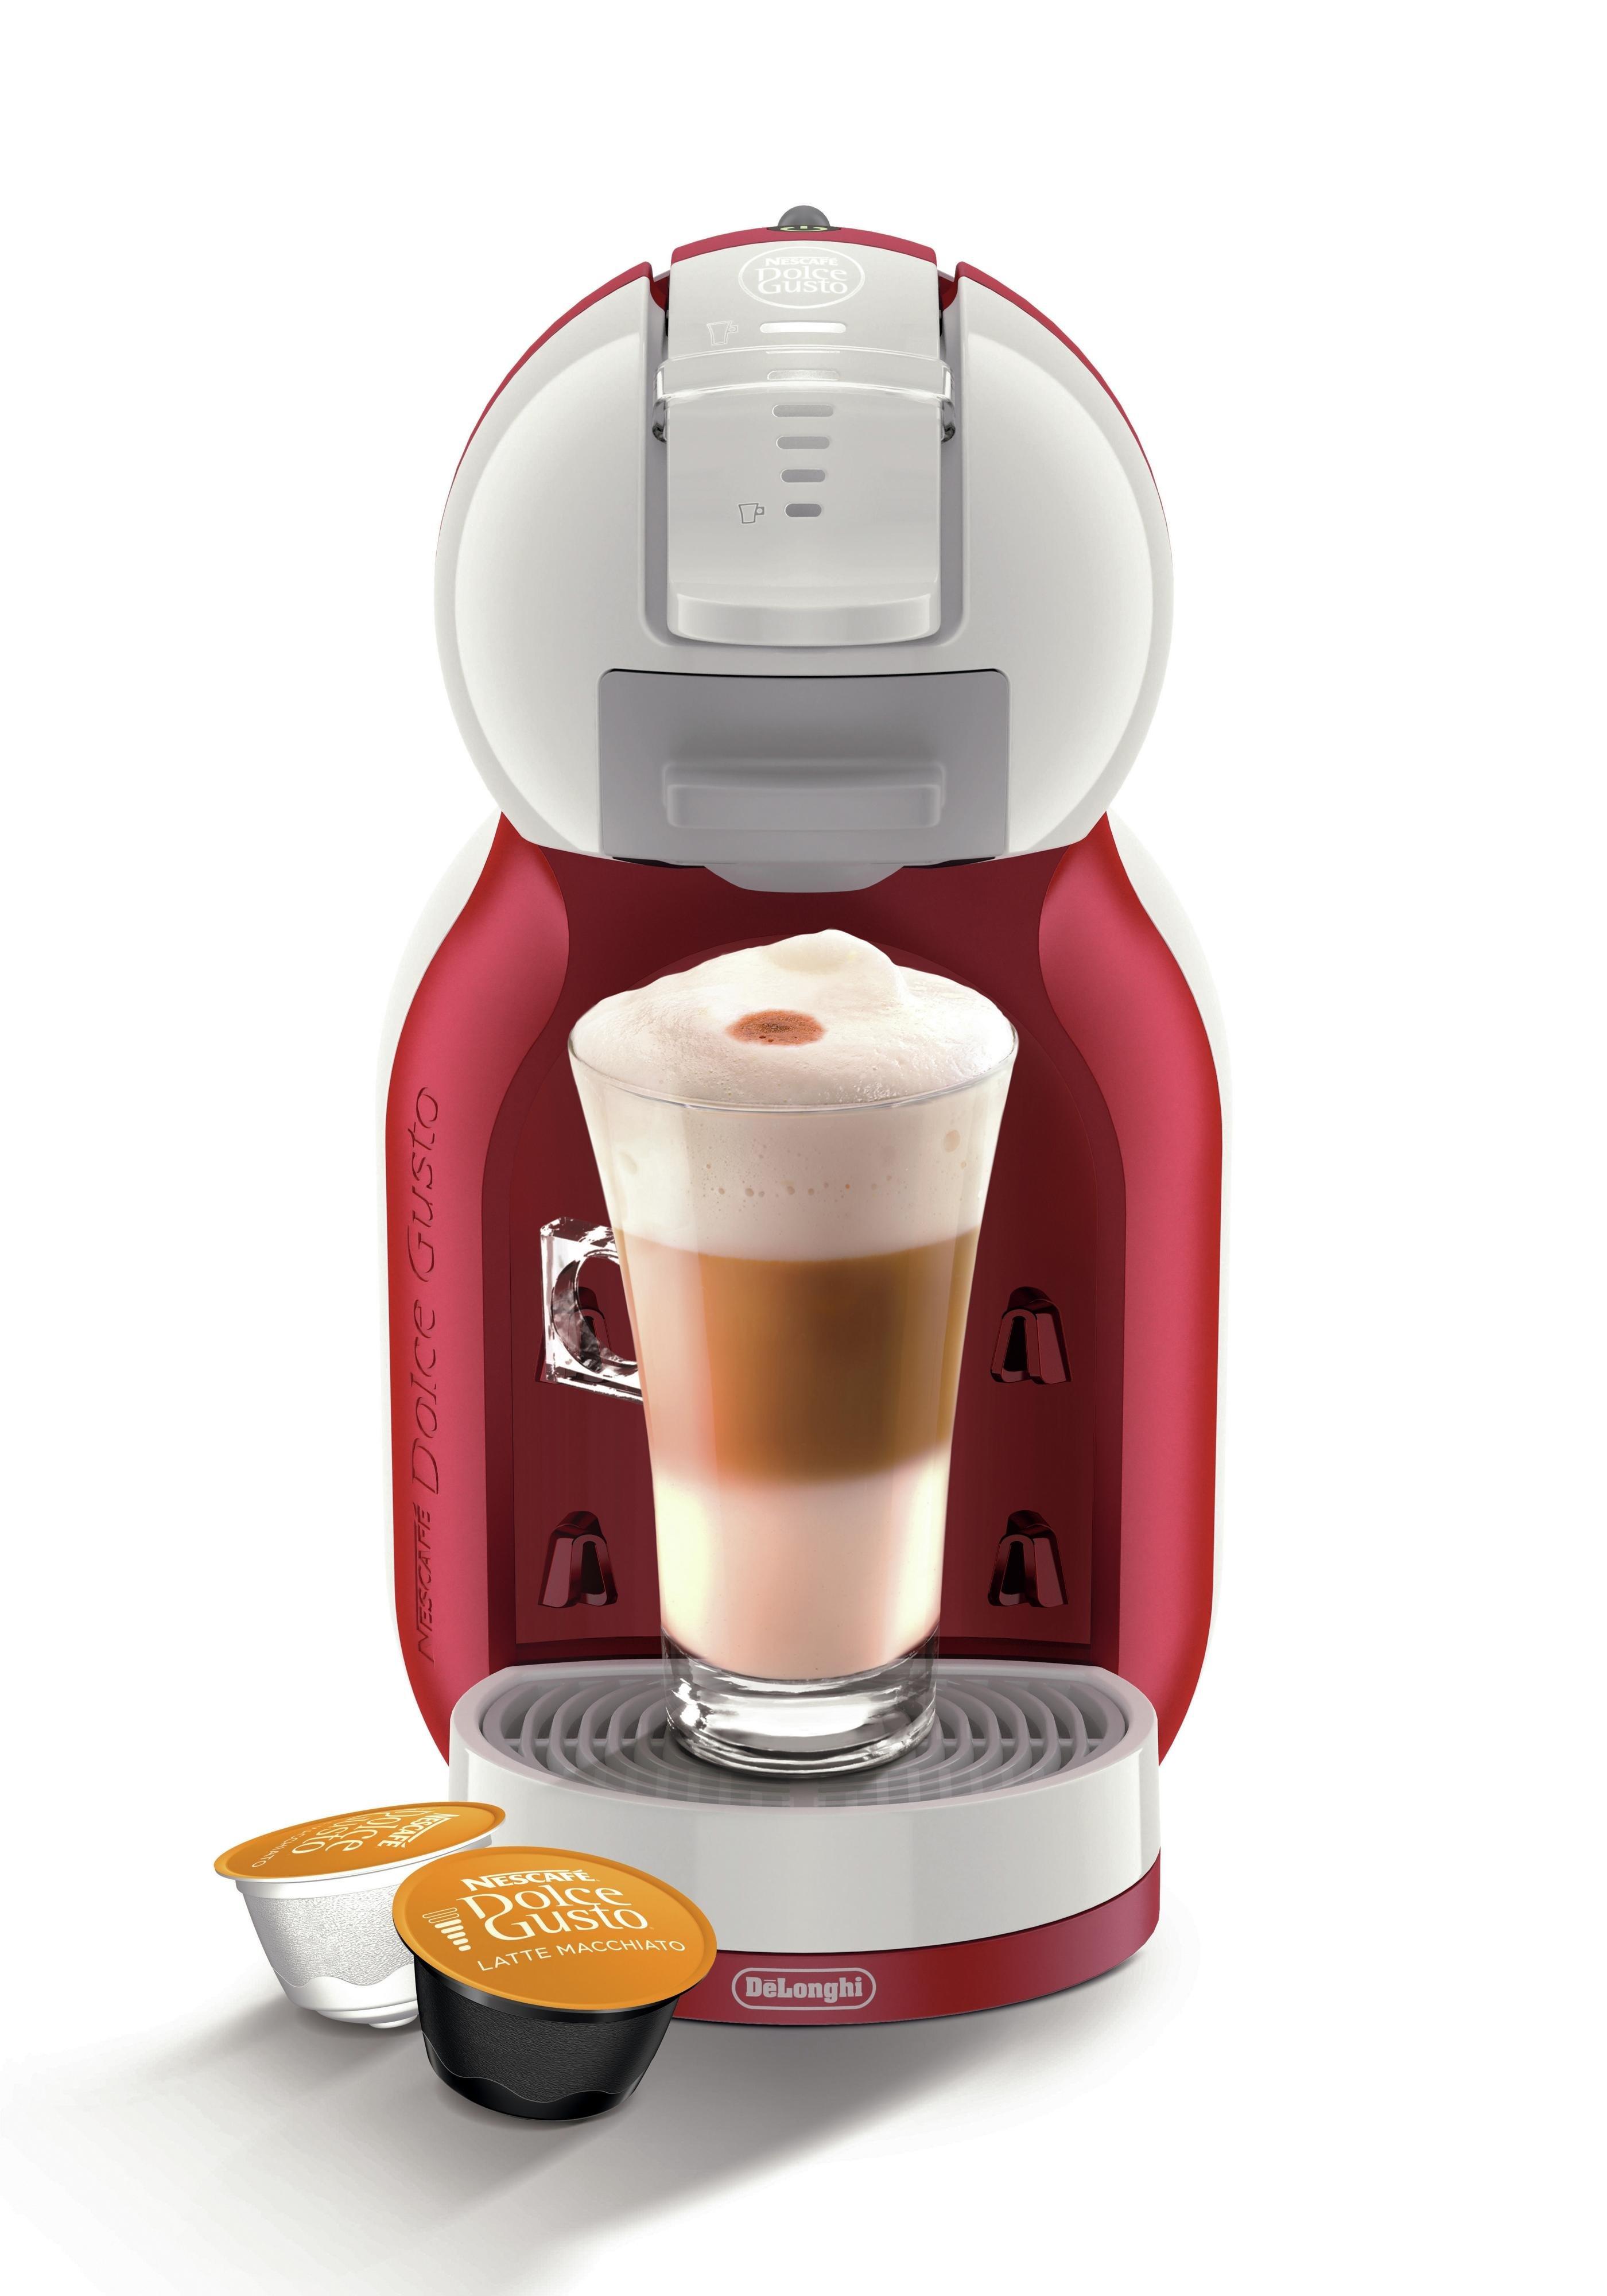 NESCAFE - Dolce Gusto Mini Me Automatic - Coffee Machine- Red